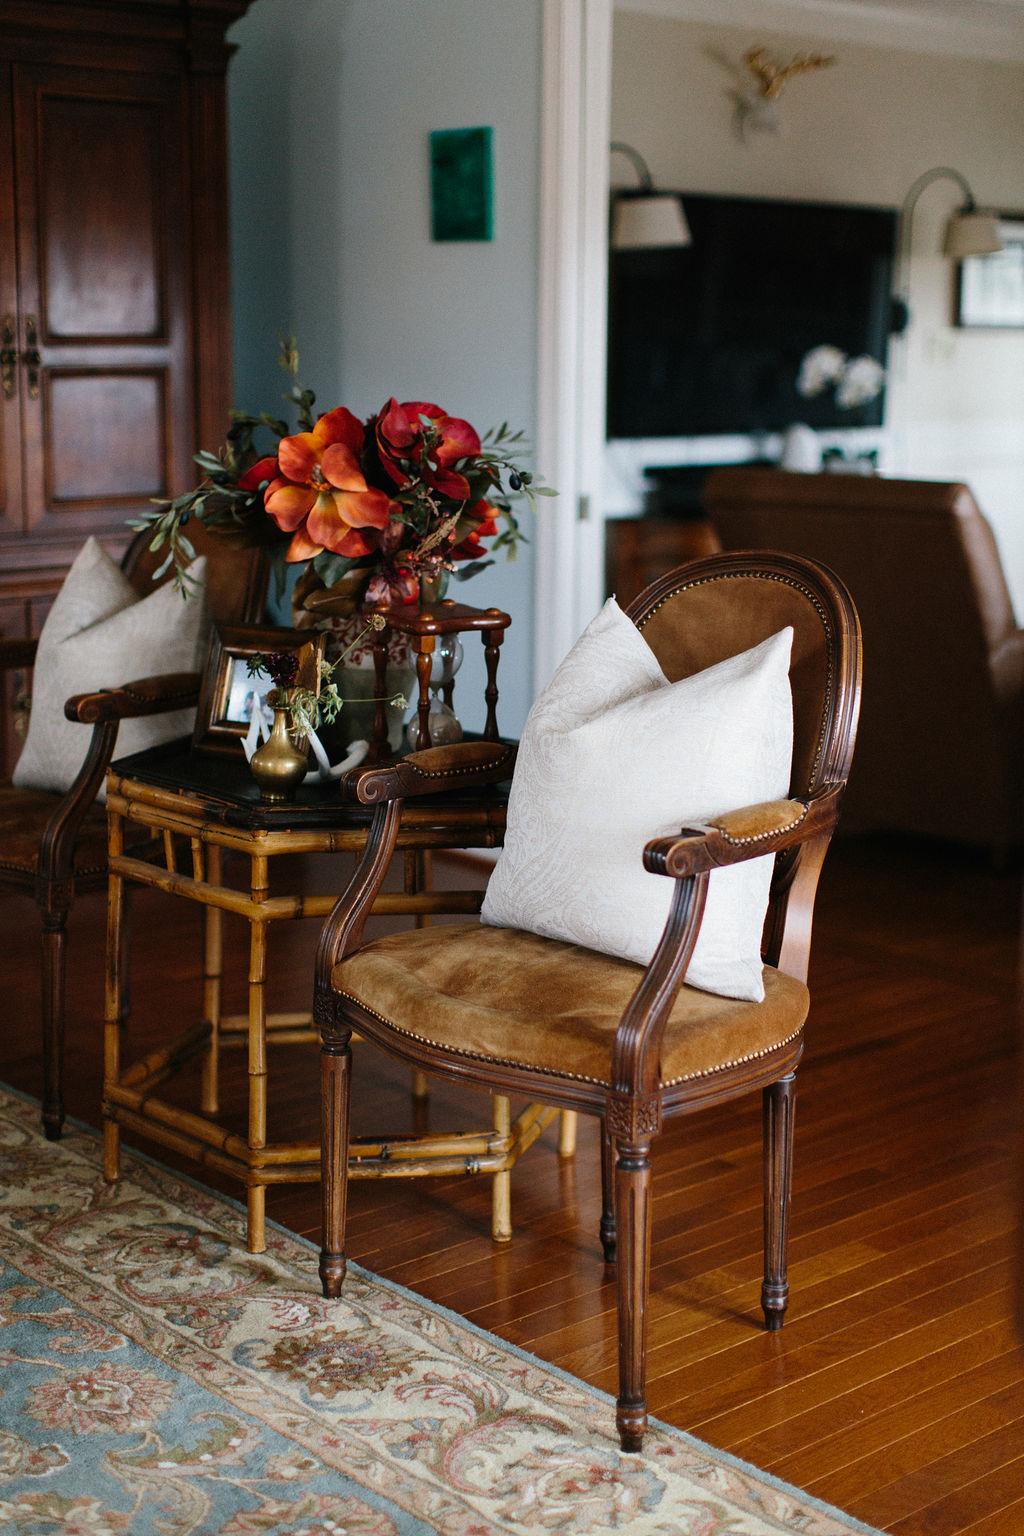 Journey-Jacobs-Design-Studio-Louisville-Residential-Commercial-Hospitality-Interior-Design-Traditional-Modern-13.JPG